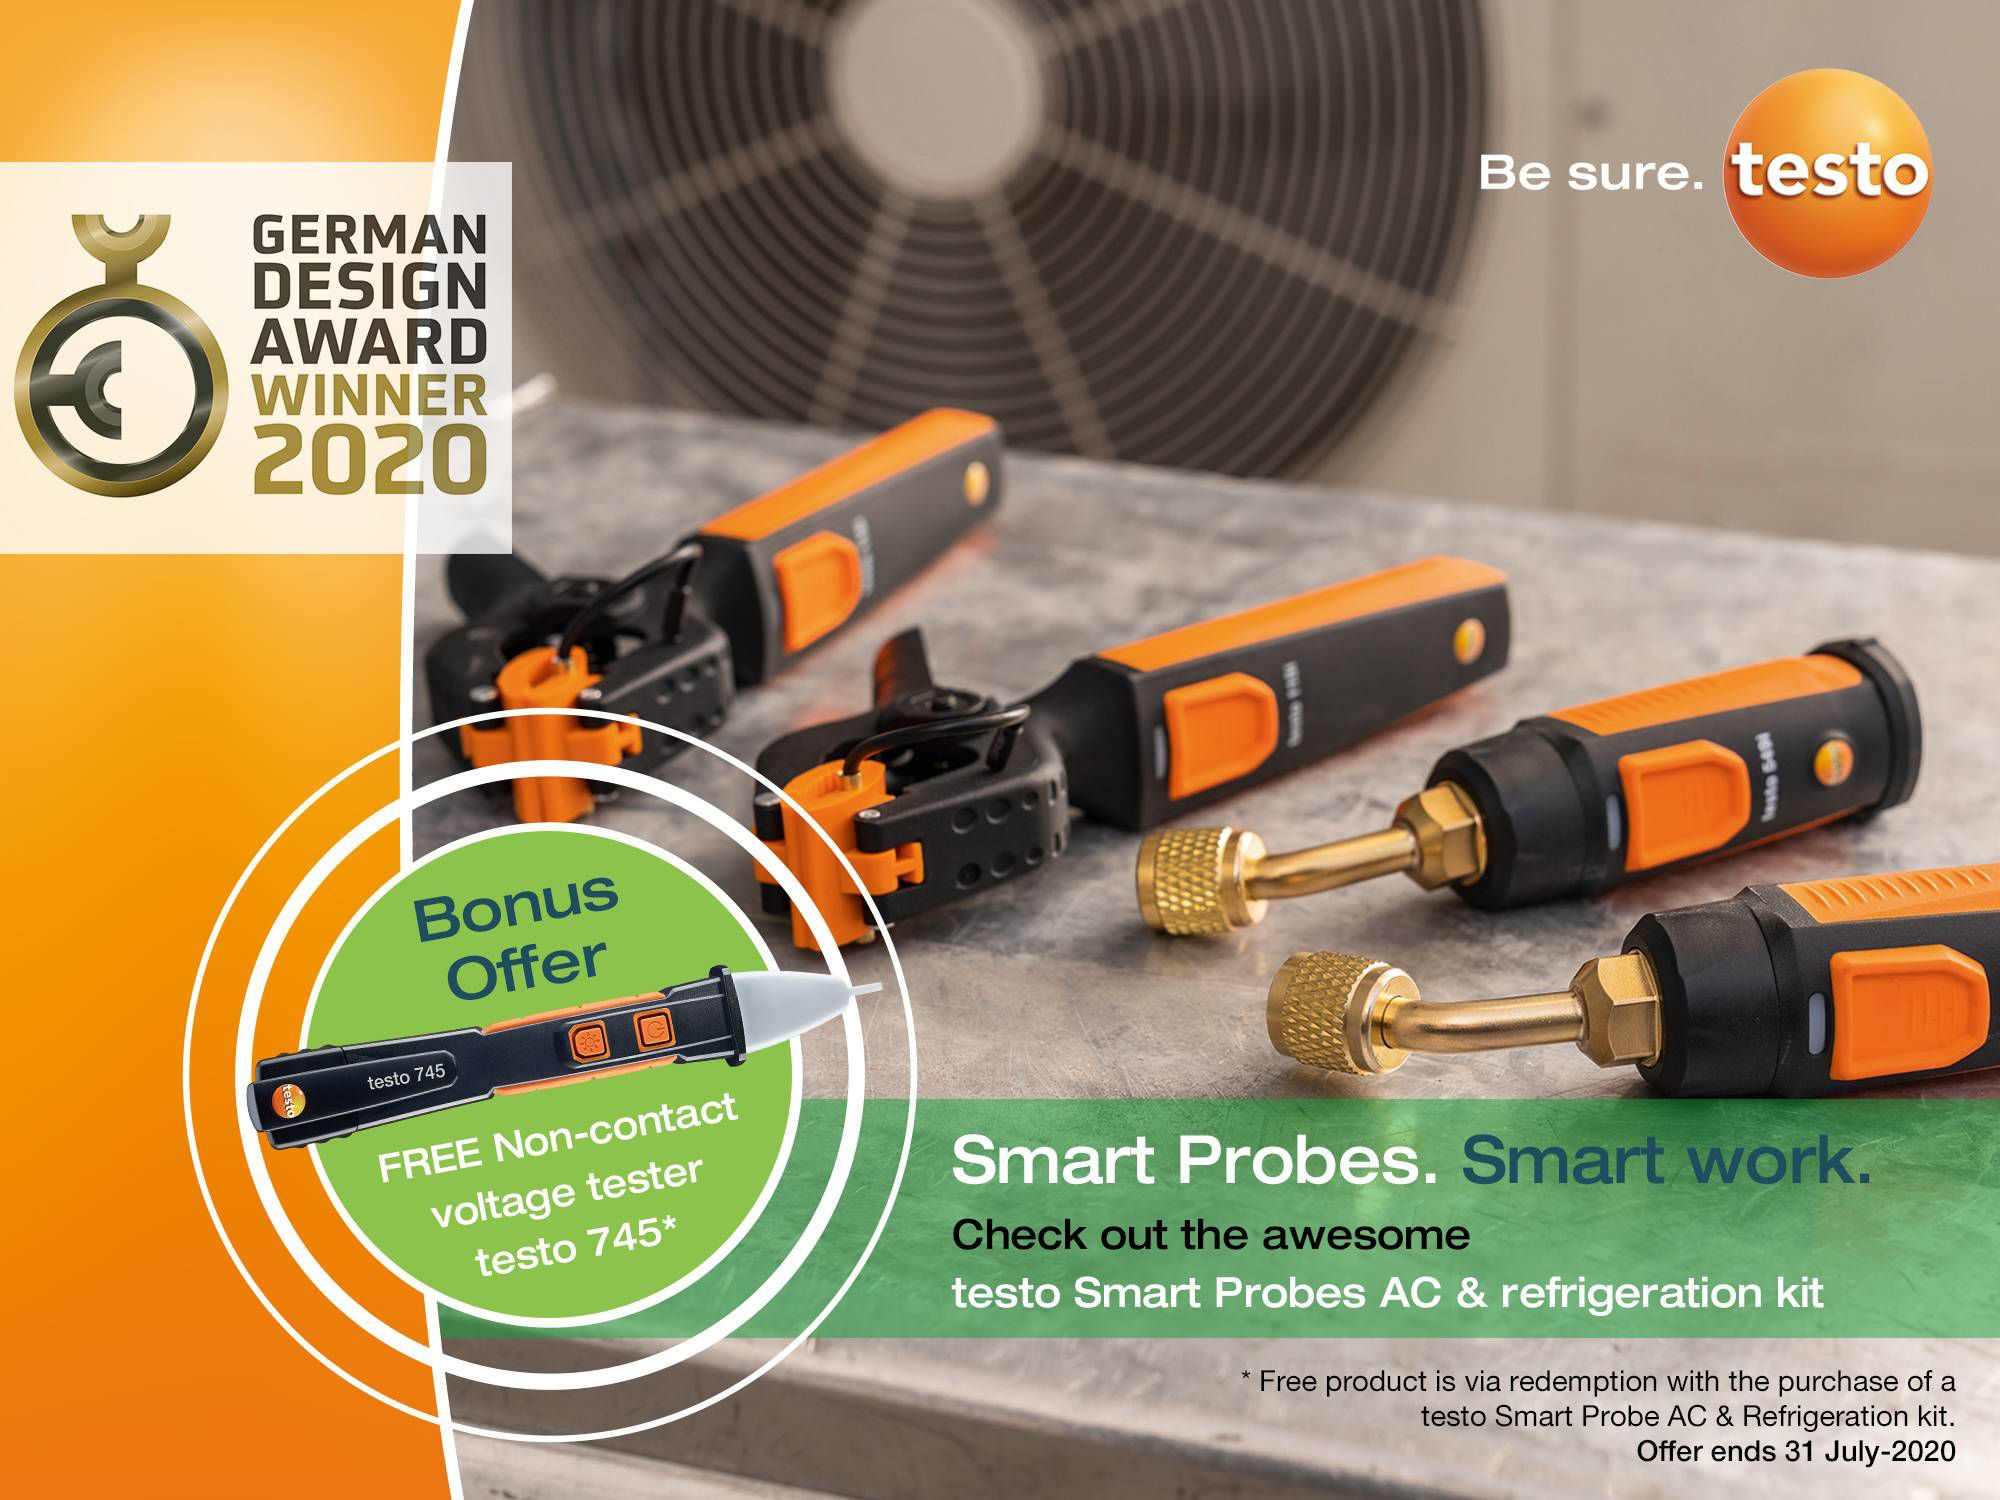 testo-Smart-Probes+FREE-745_MREC_2000x1500-ii.jpg